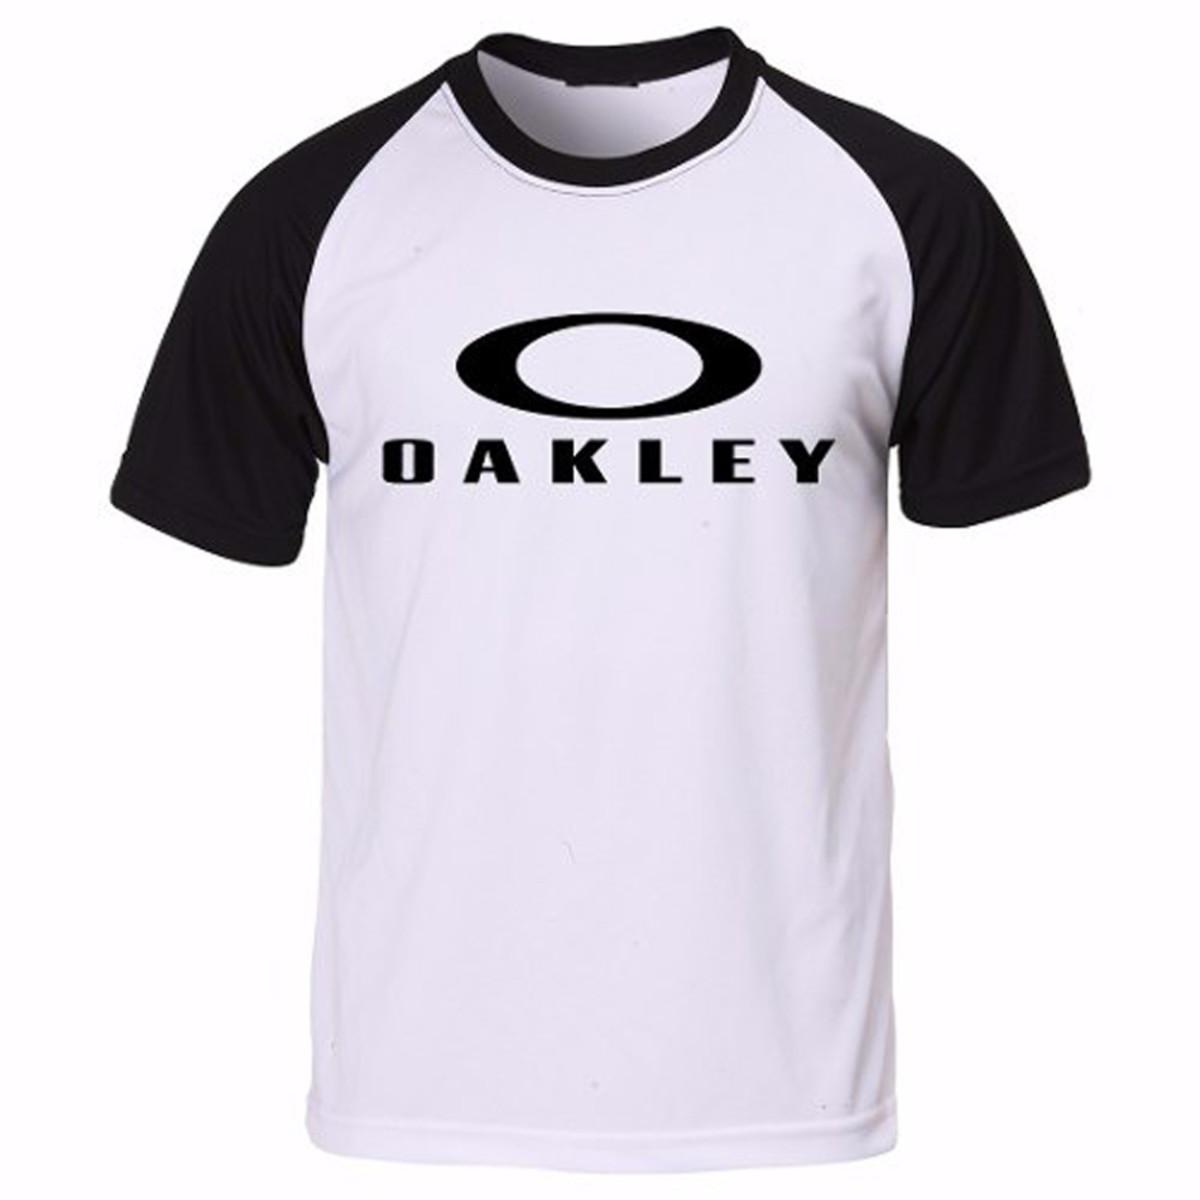 c3c8314adf Camisa Oakley « One More Soul